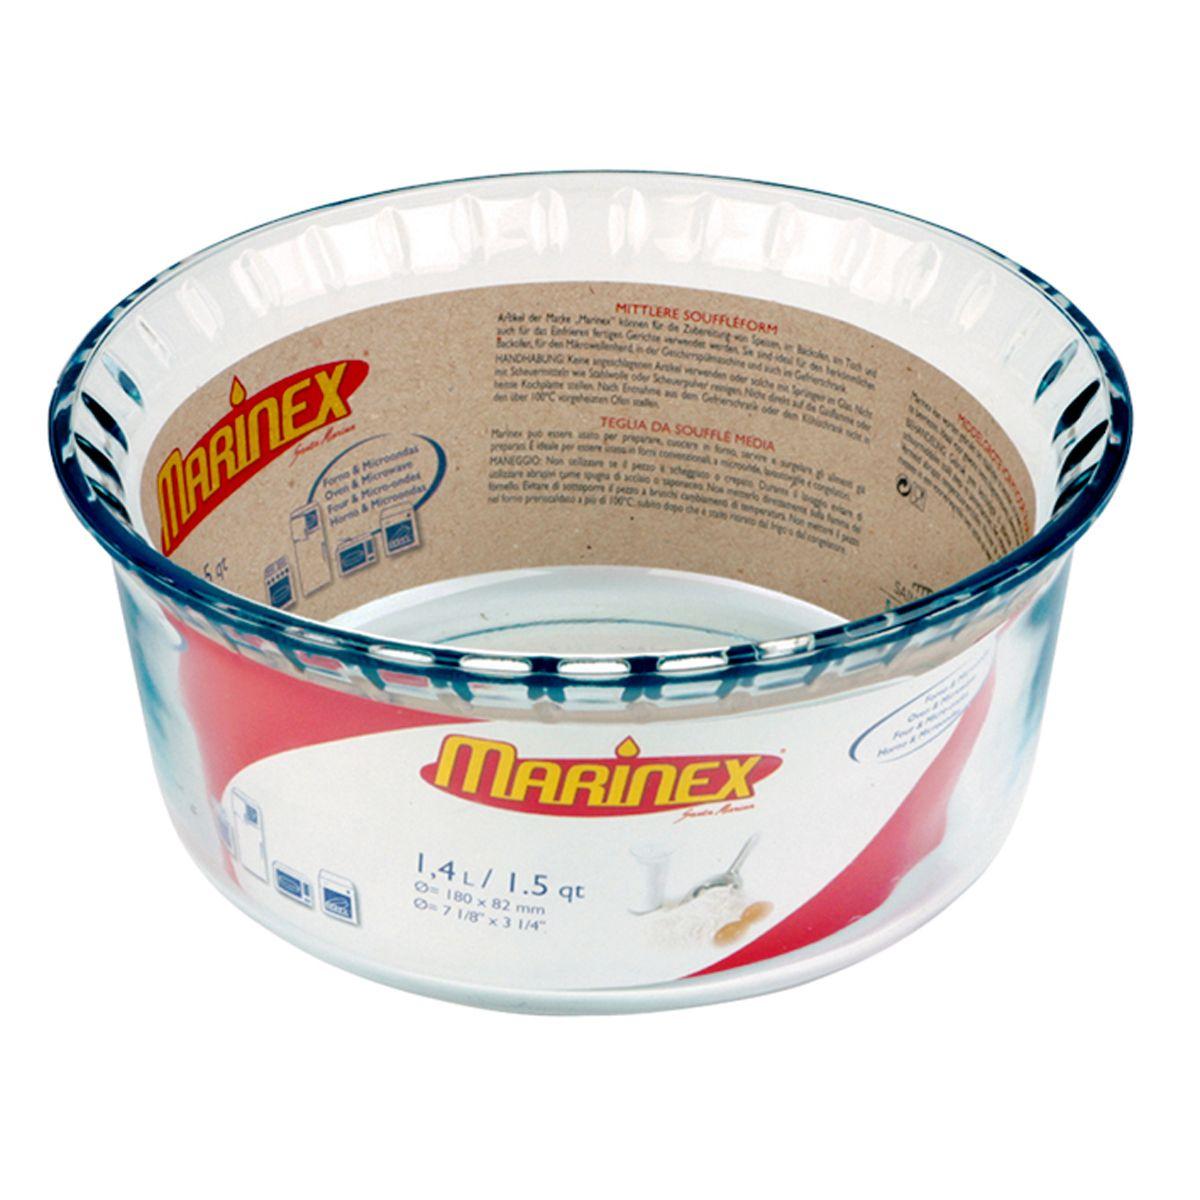 Marinex brazil souffle bowl the marinex line of bakeware